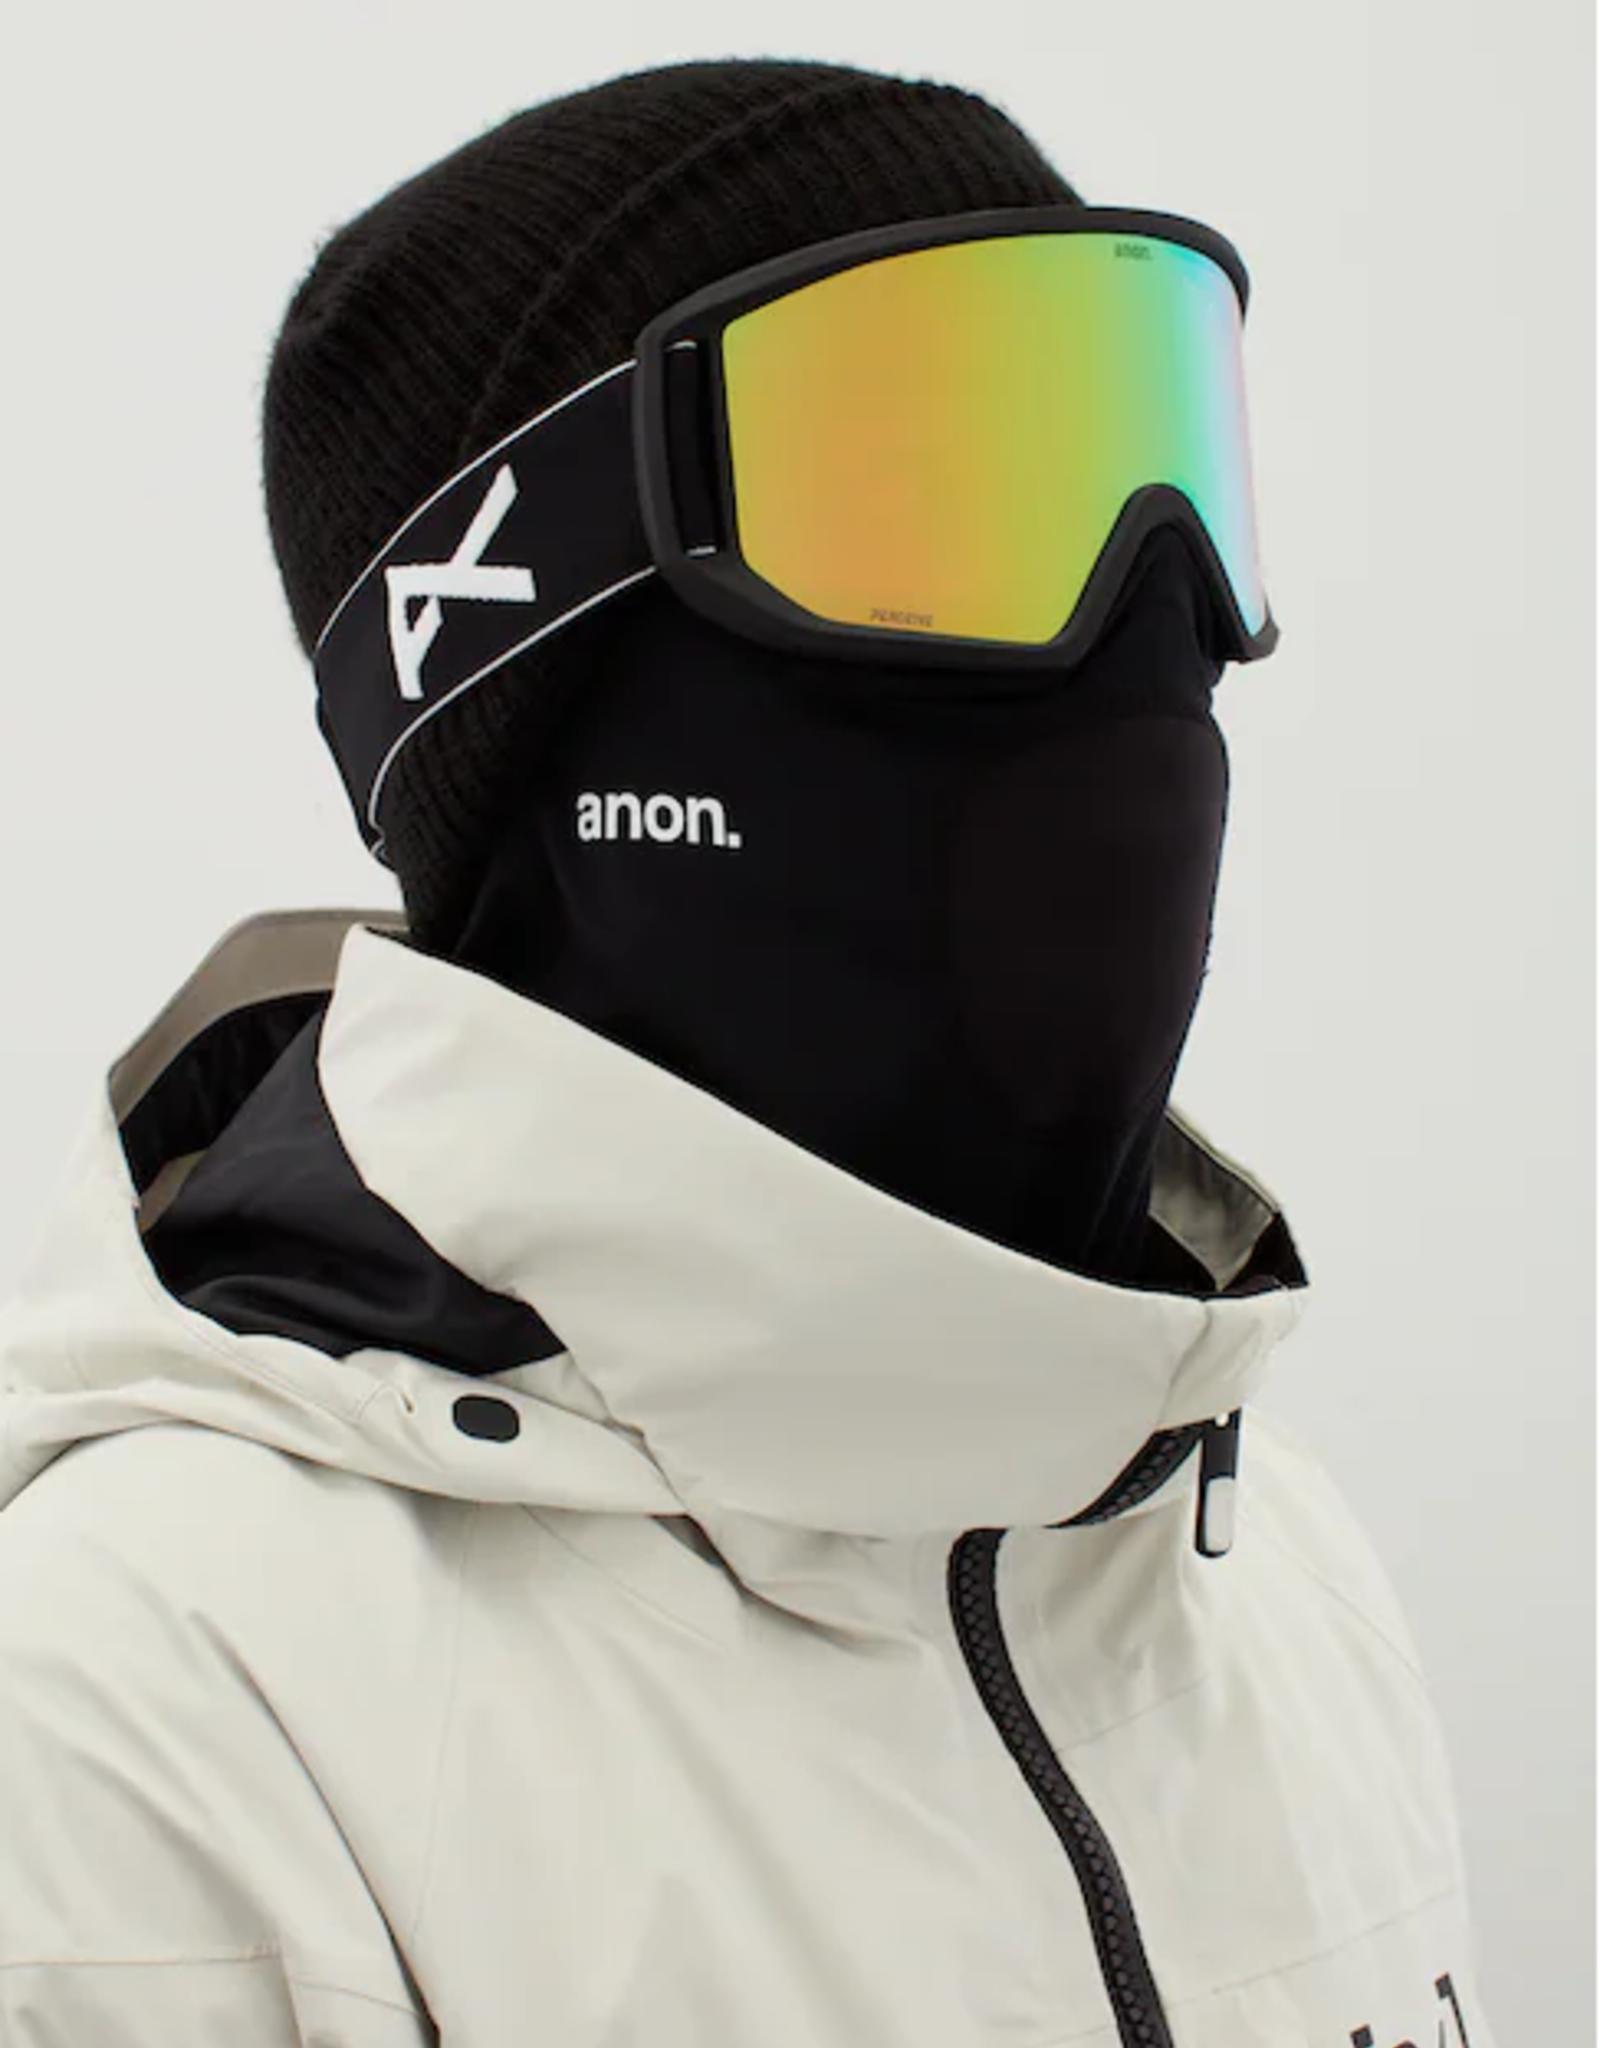 Anon Anon - RELAPSE MFI - Black w/ PERCEIVE Variable Green + BONUS Lens + Mask